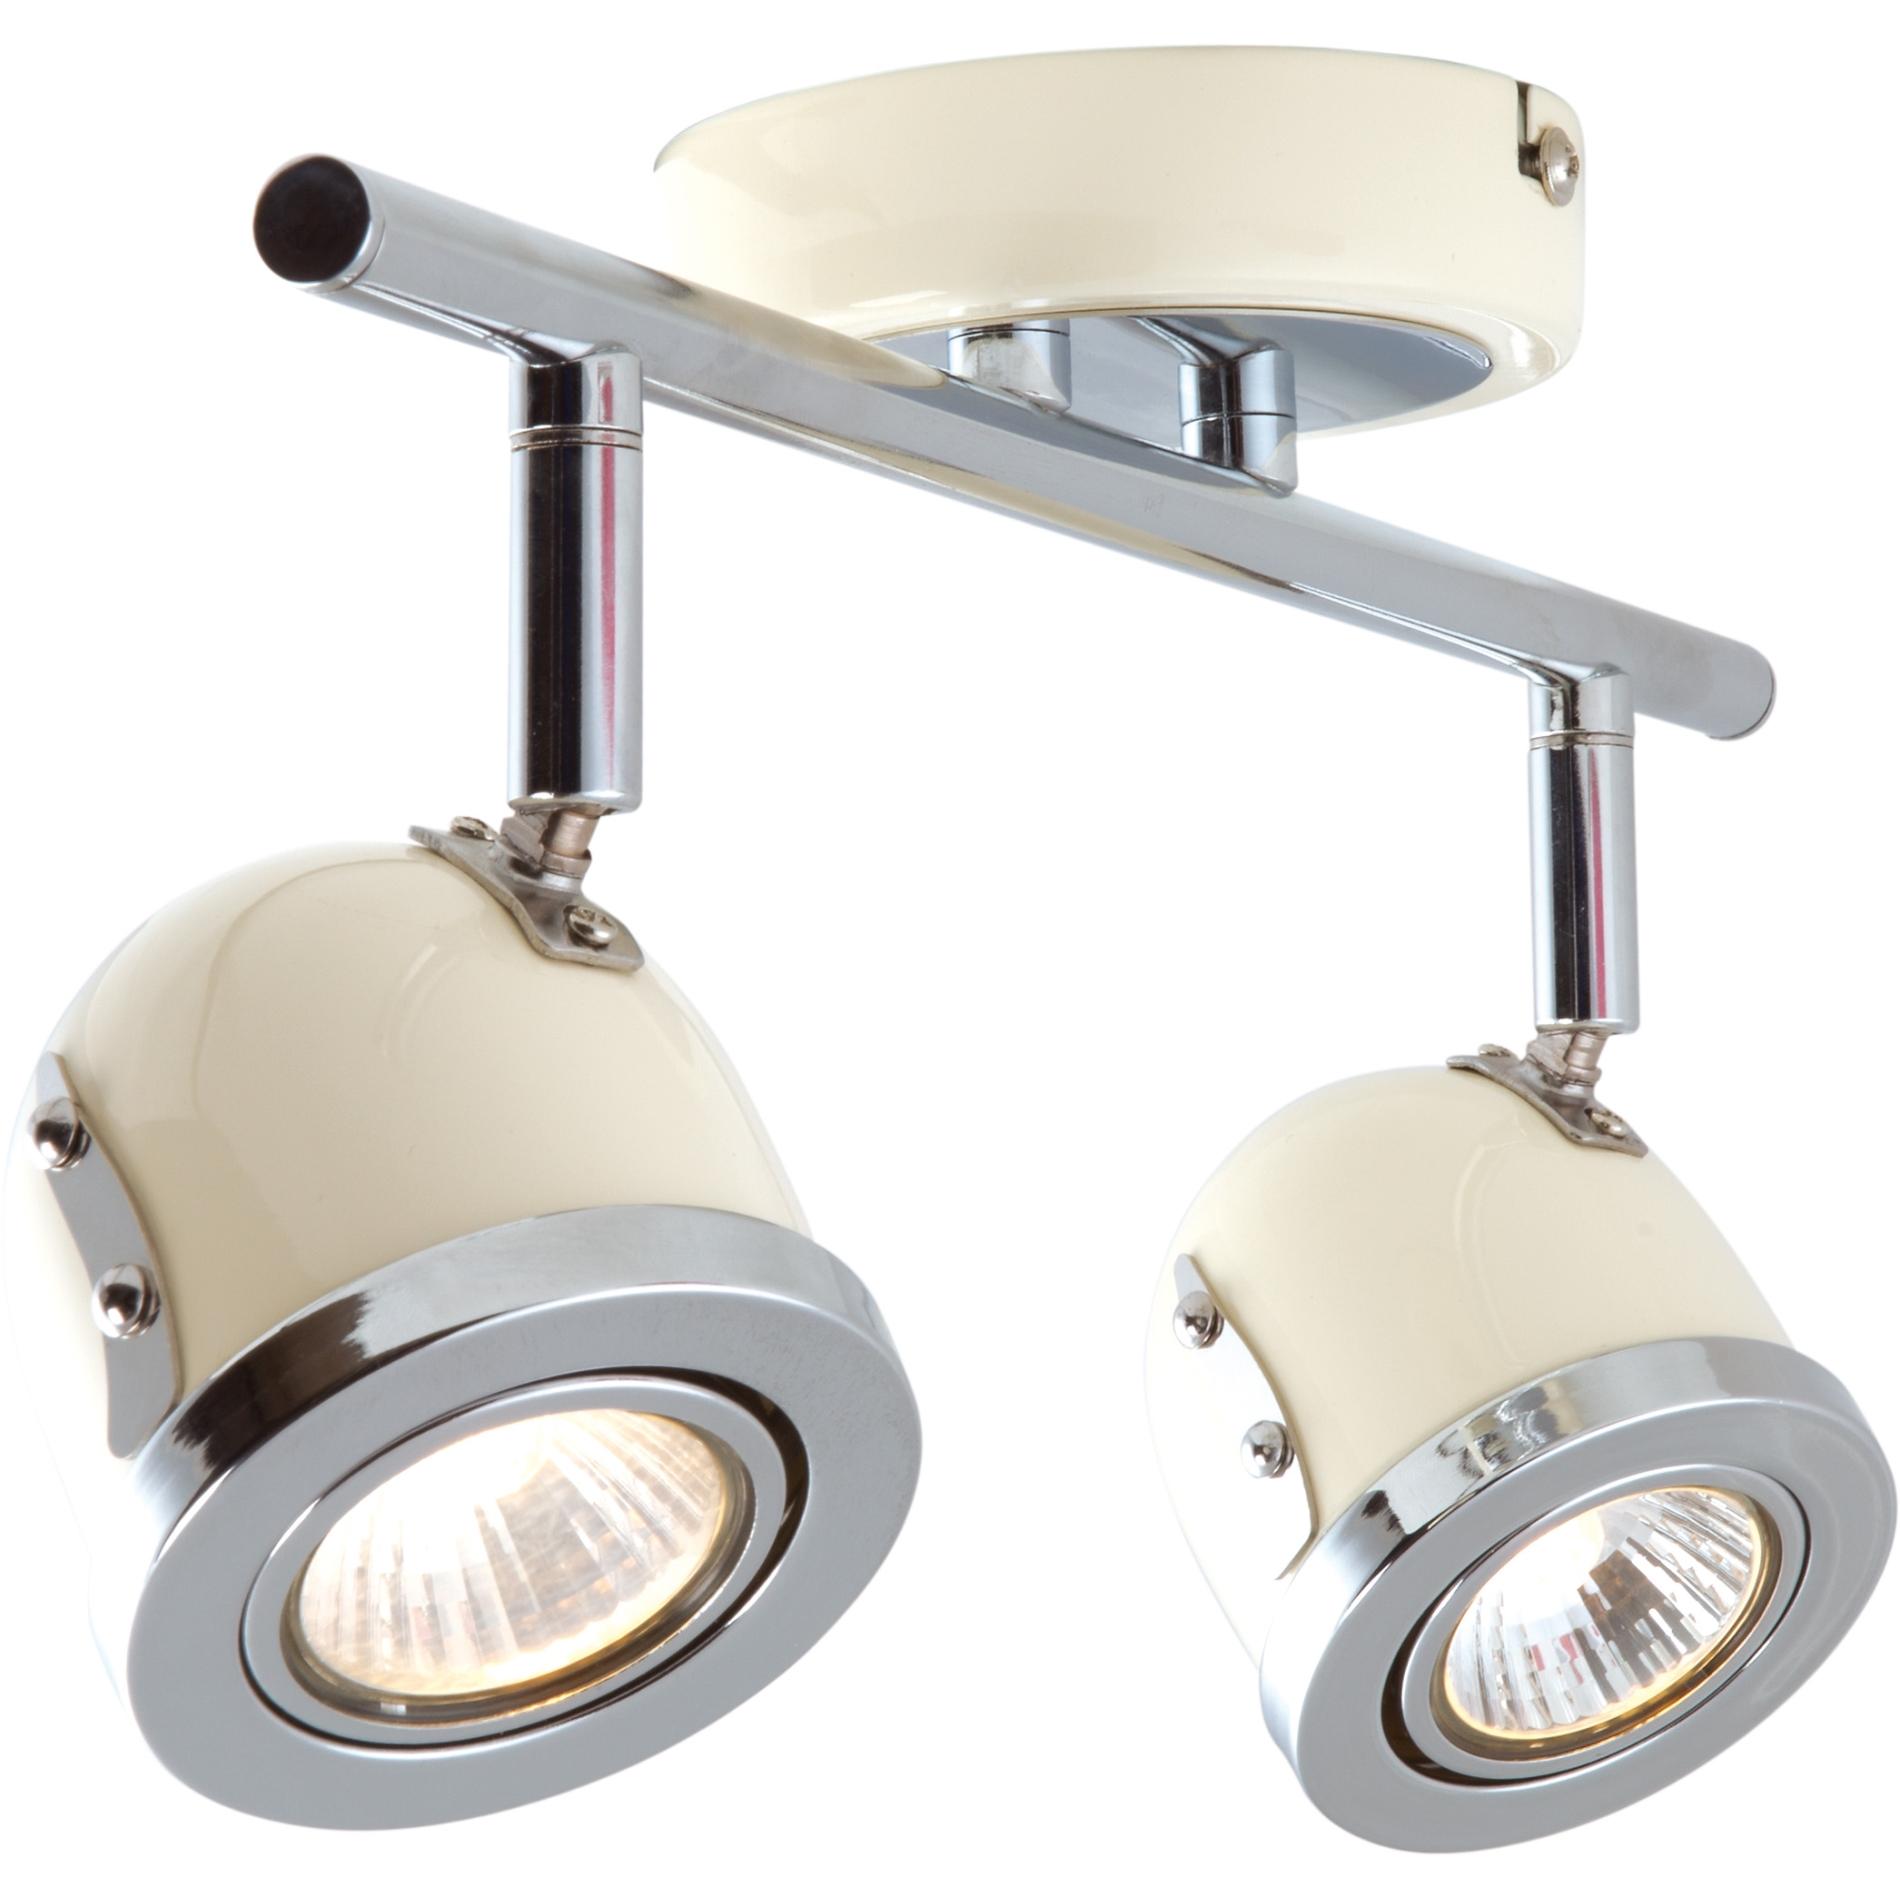 deckenstrahler bel air 2 flammig vanille spot heitronic retro chrom deckenlampe ebay. Black Bedroom Furniture Sets. Home Design Ideas